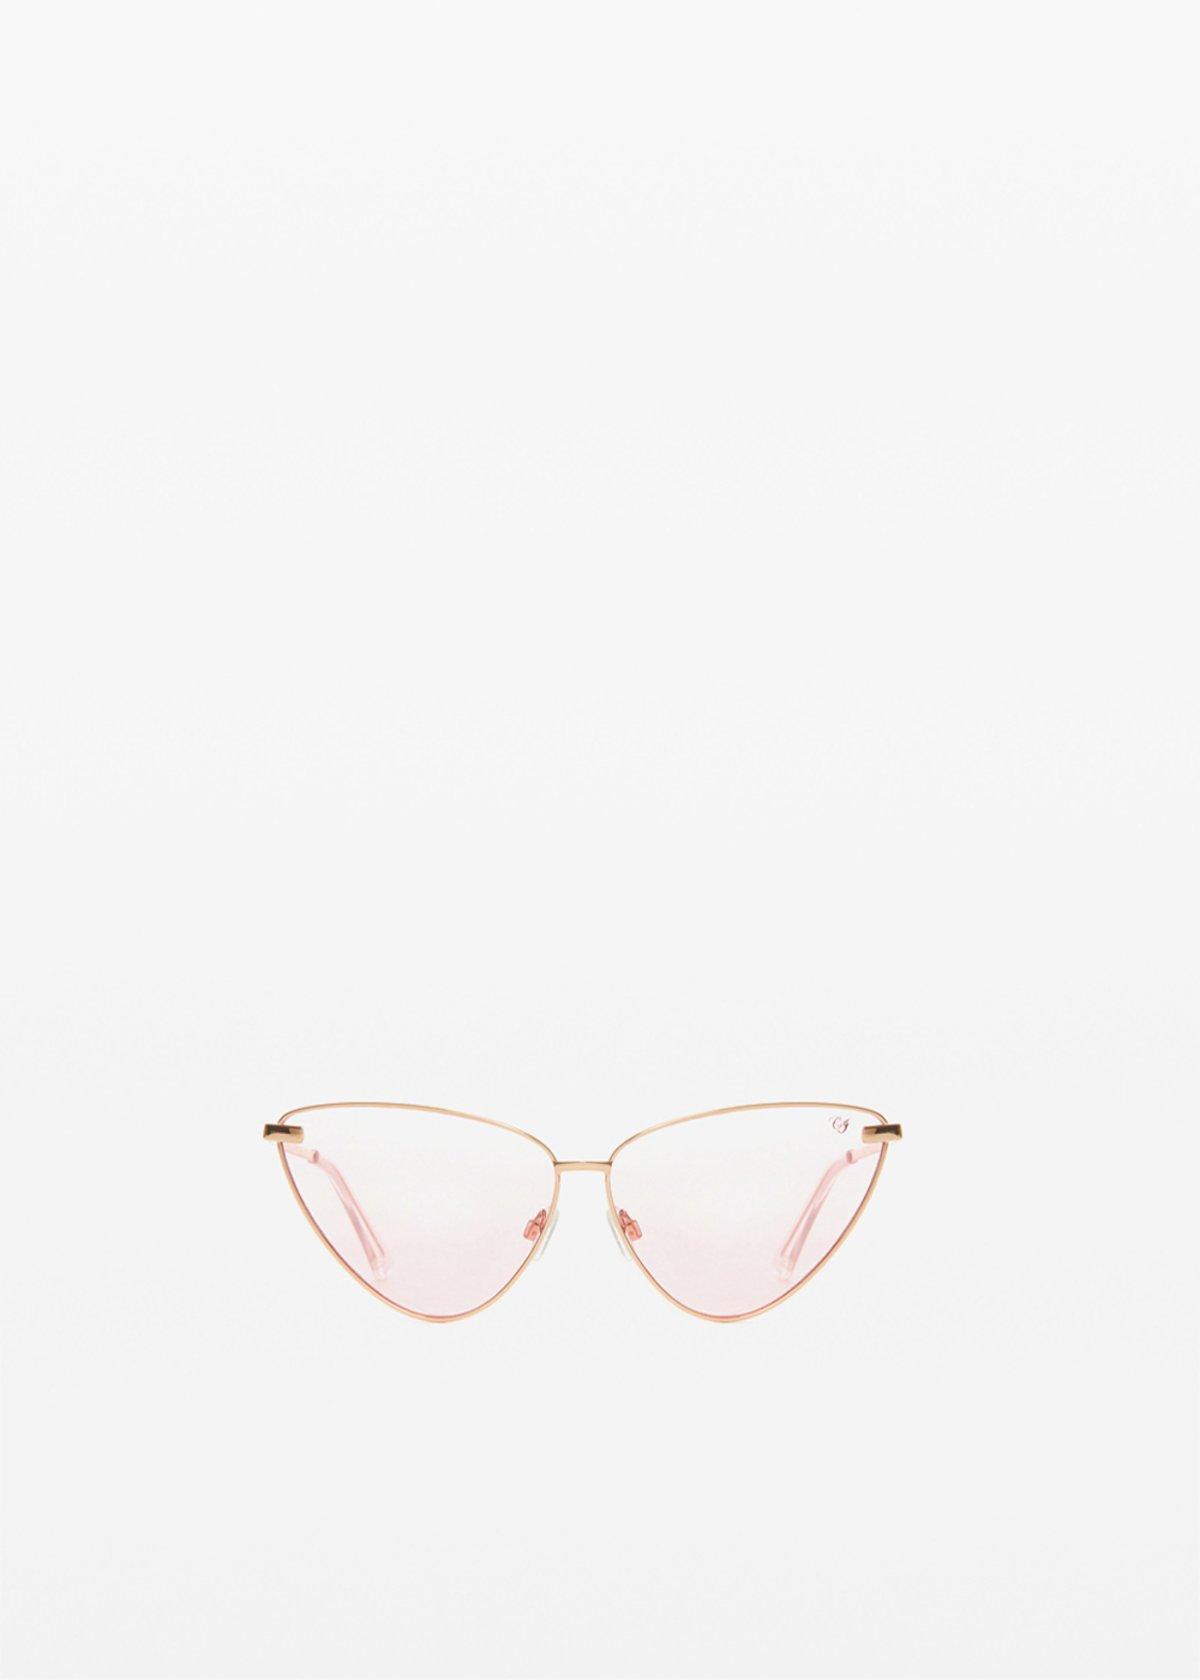 Cat-eye sunglasses SR 2183